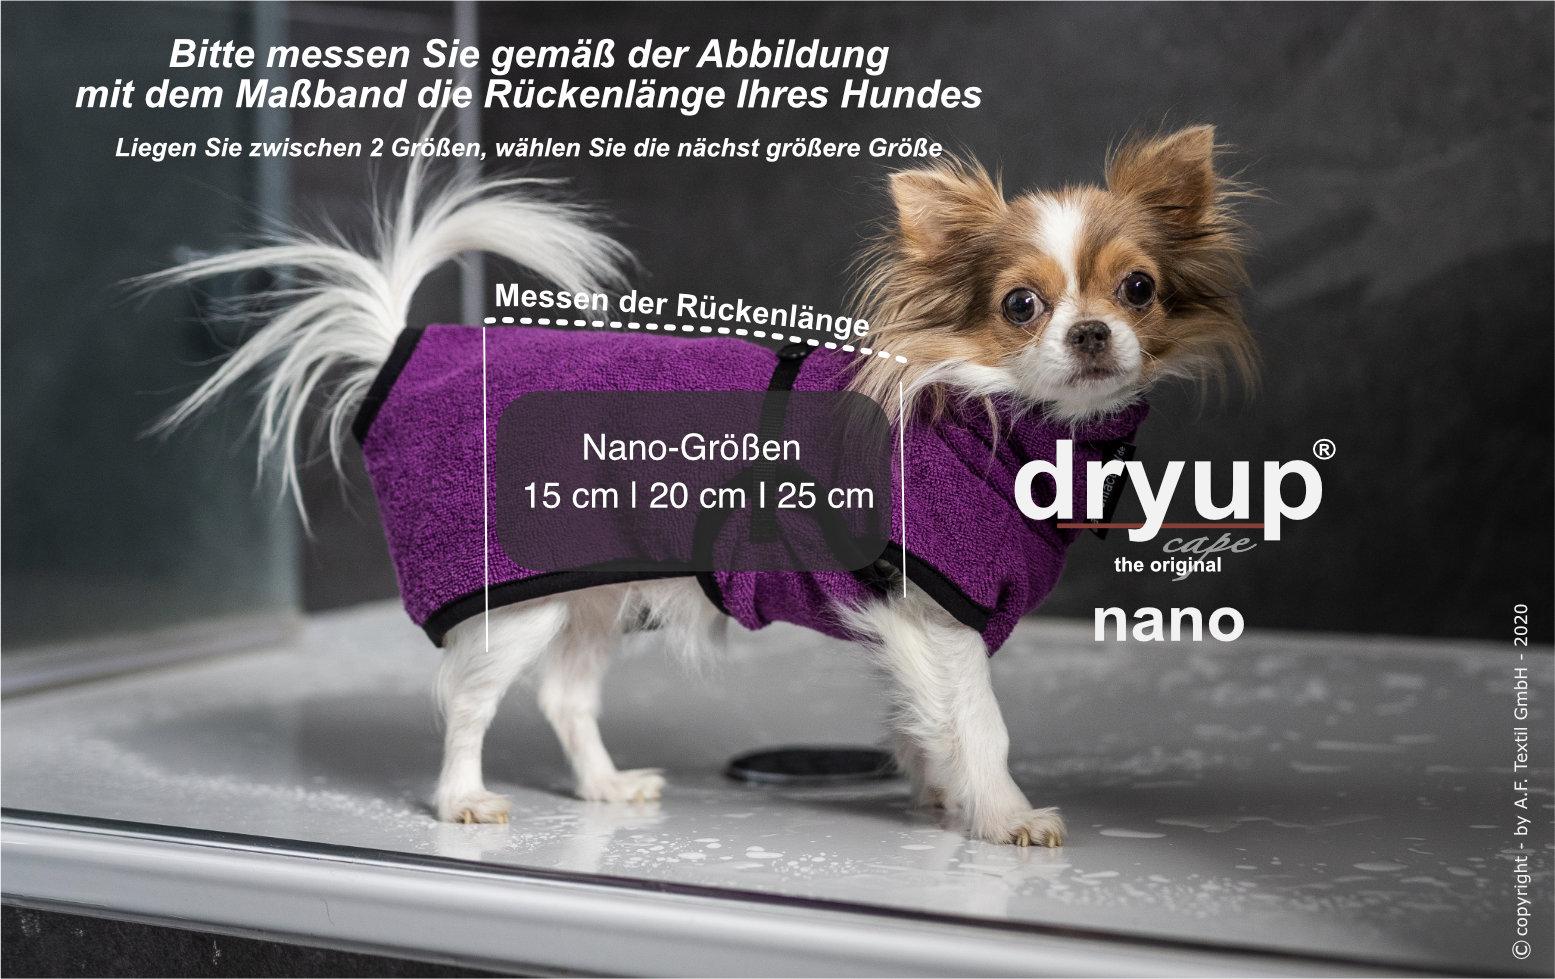 dryup-cape-nano-grossenfindung_2